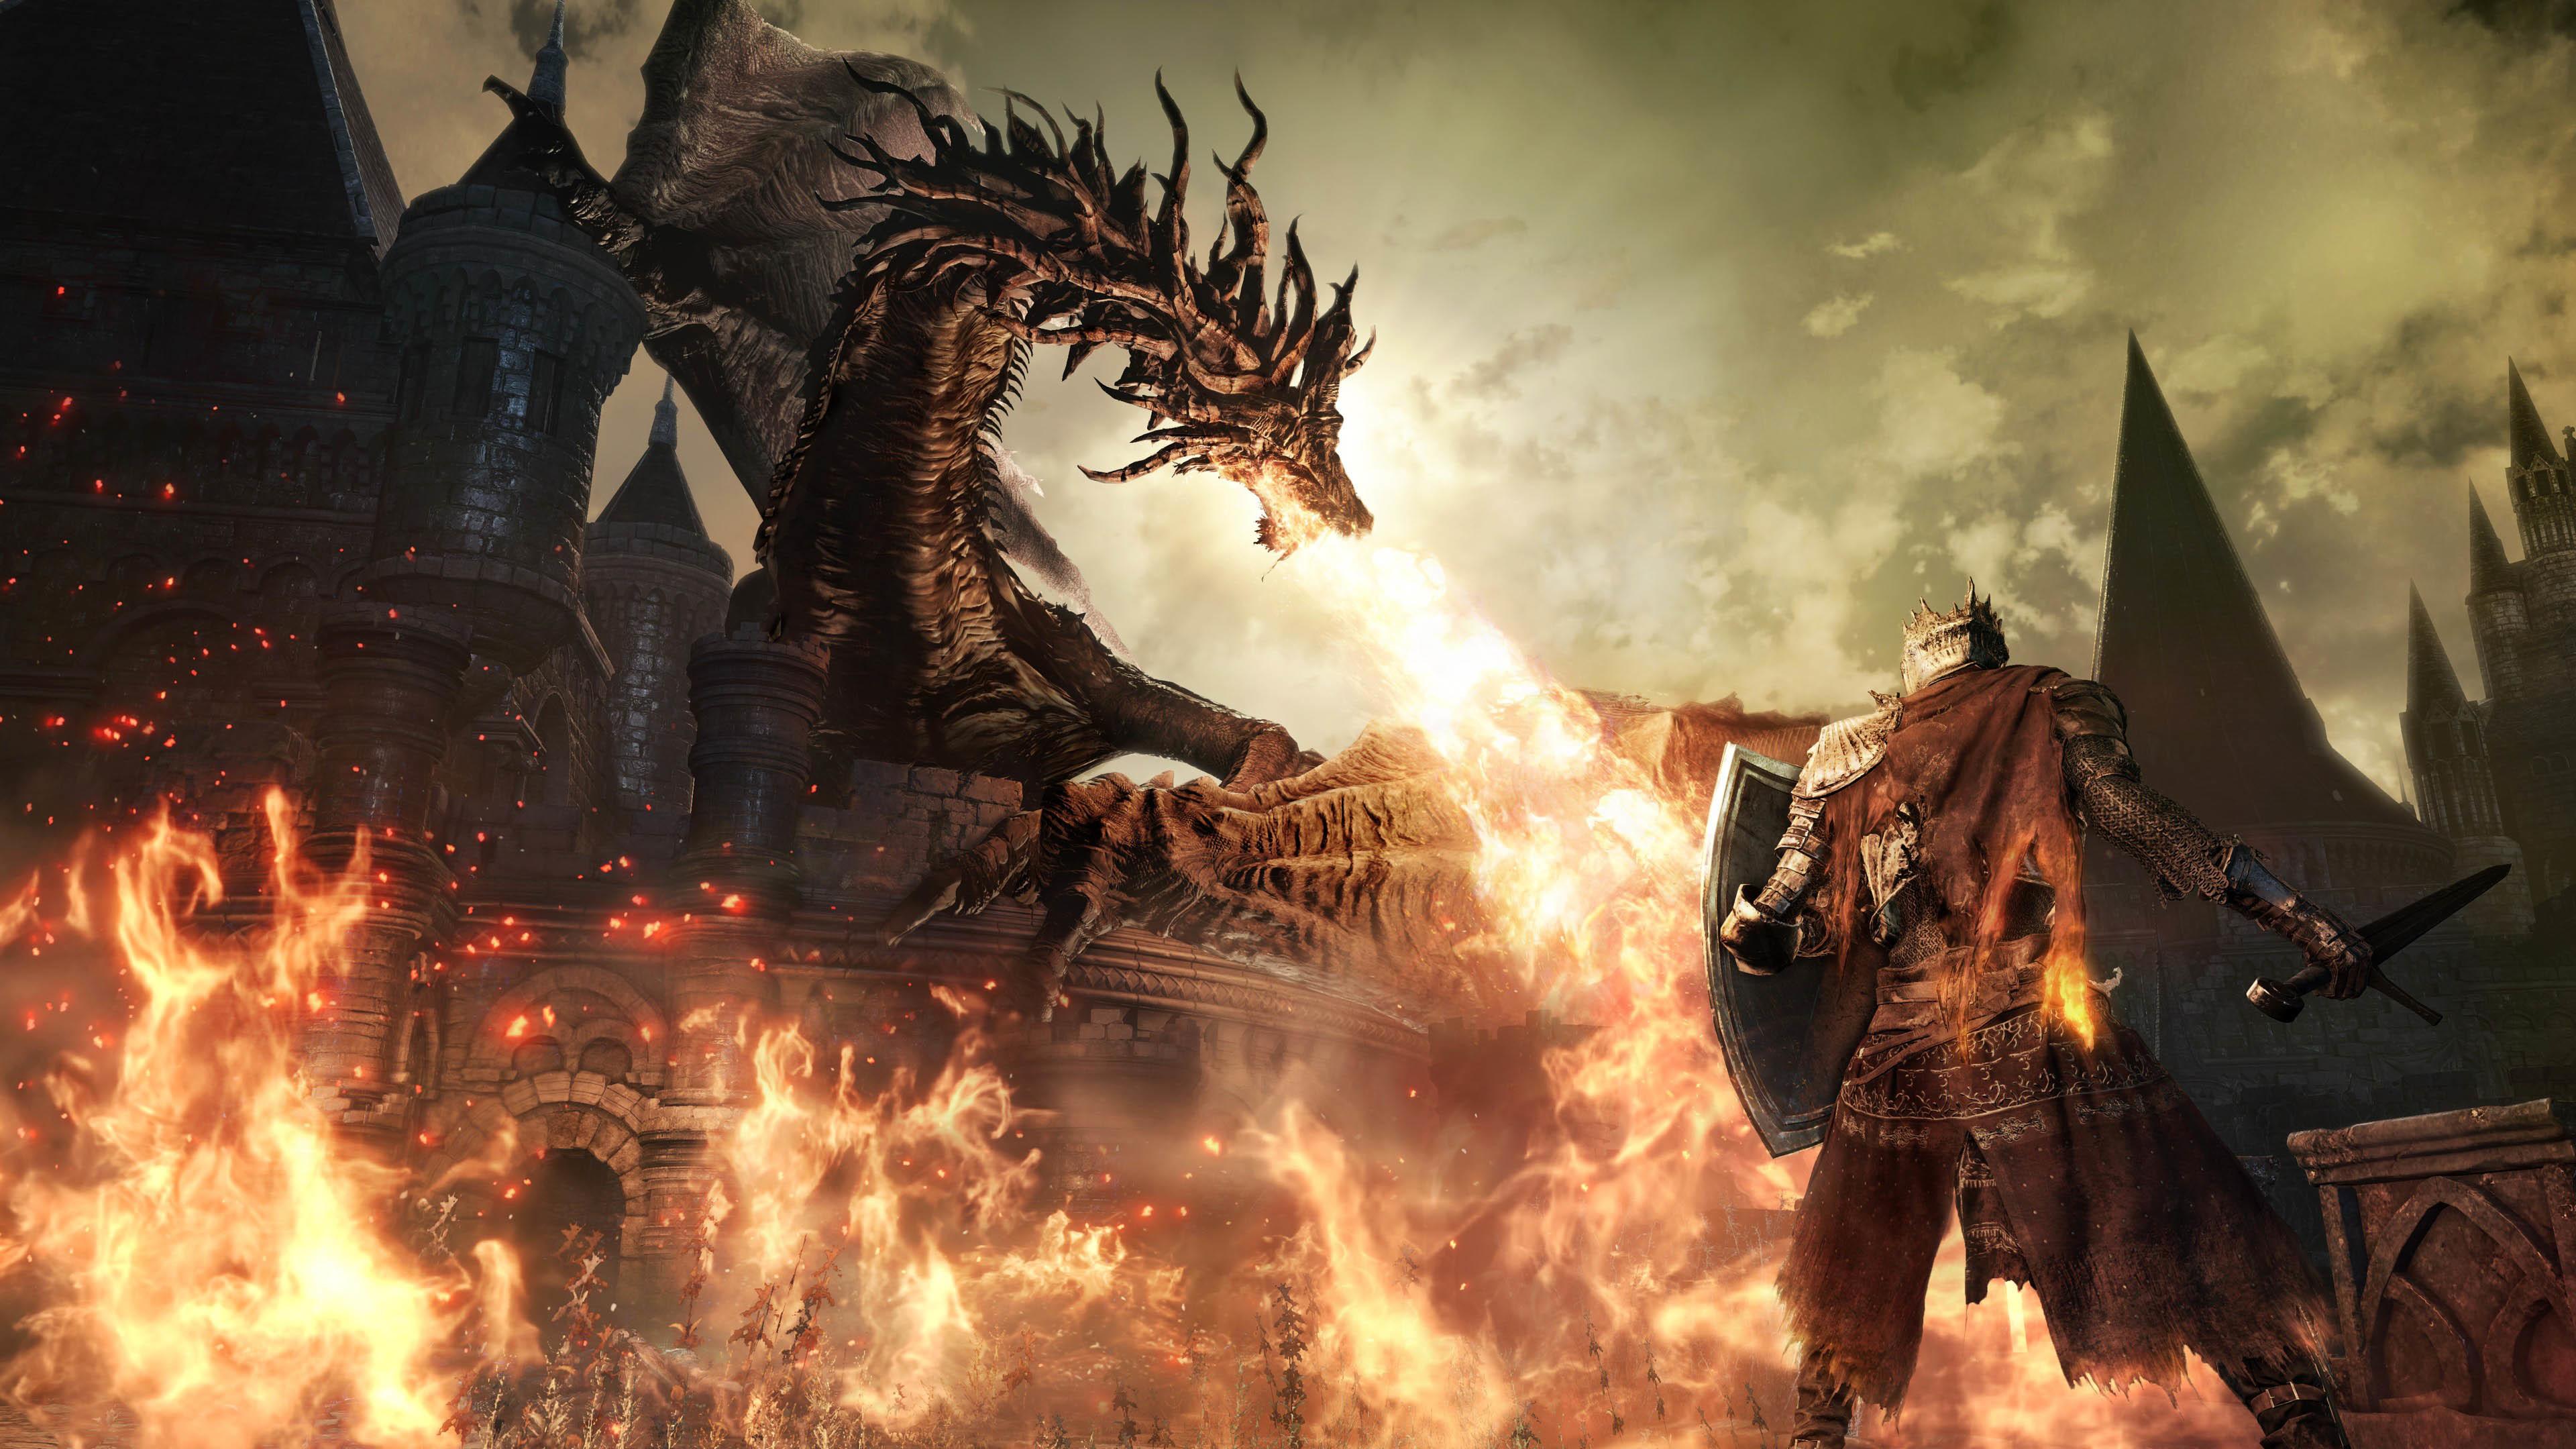 Dark Souls 3 4K wallpaper